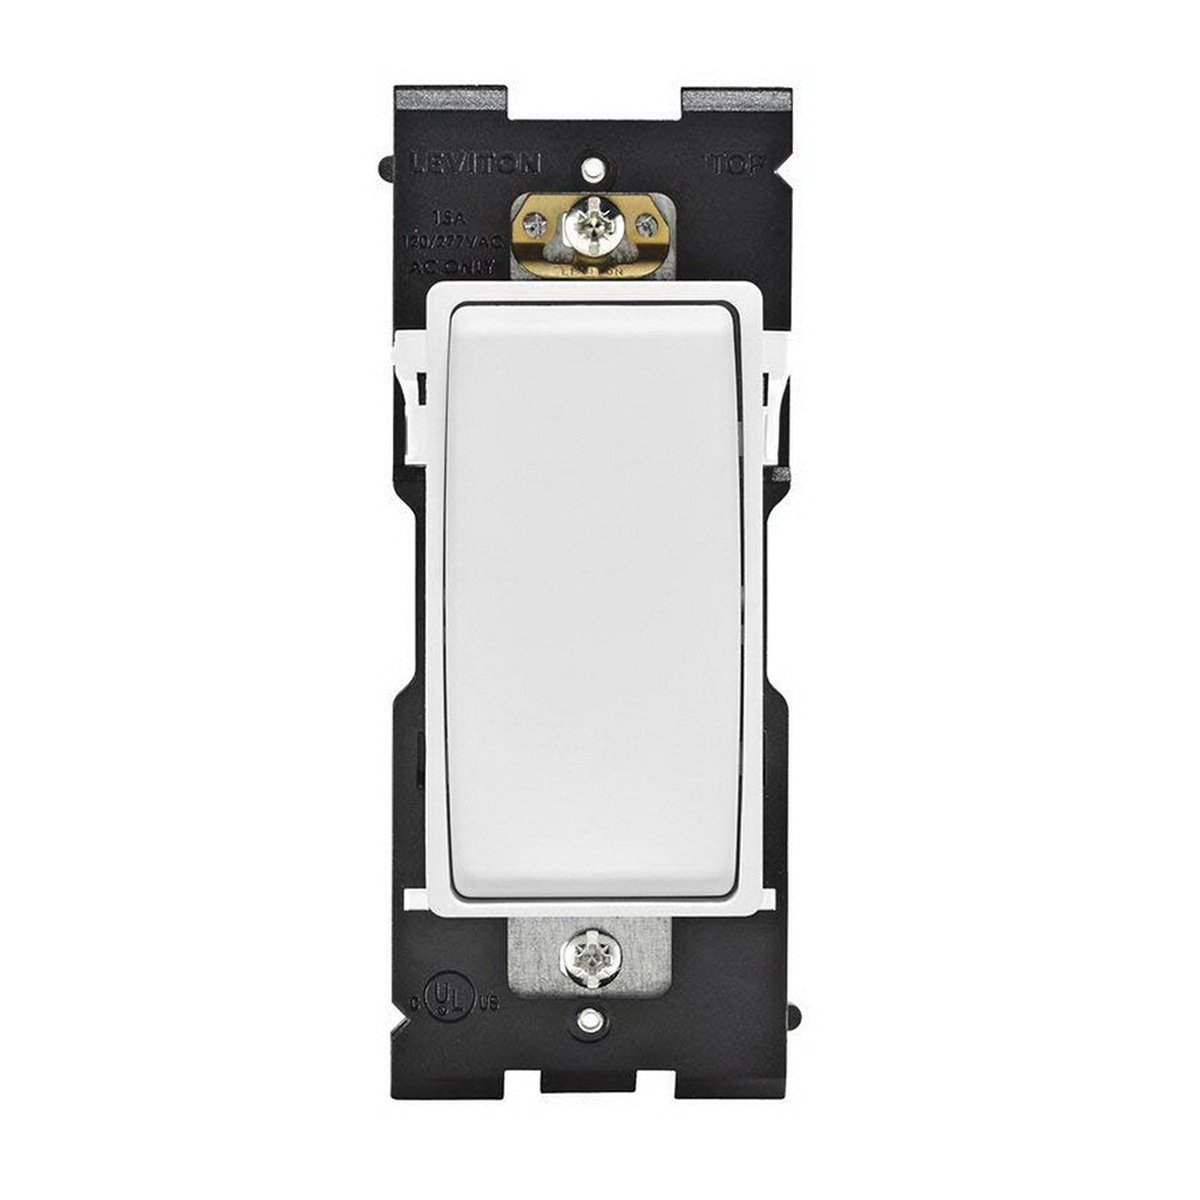 Leviton Re151 Ww 120 277 Volt Ac 15 Amp 1 Pole 3 Way 4 Switch Home Wiring